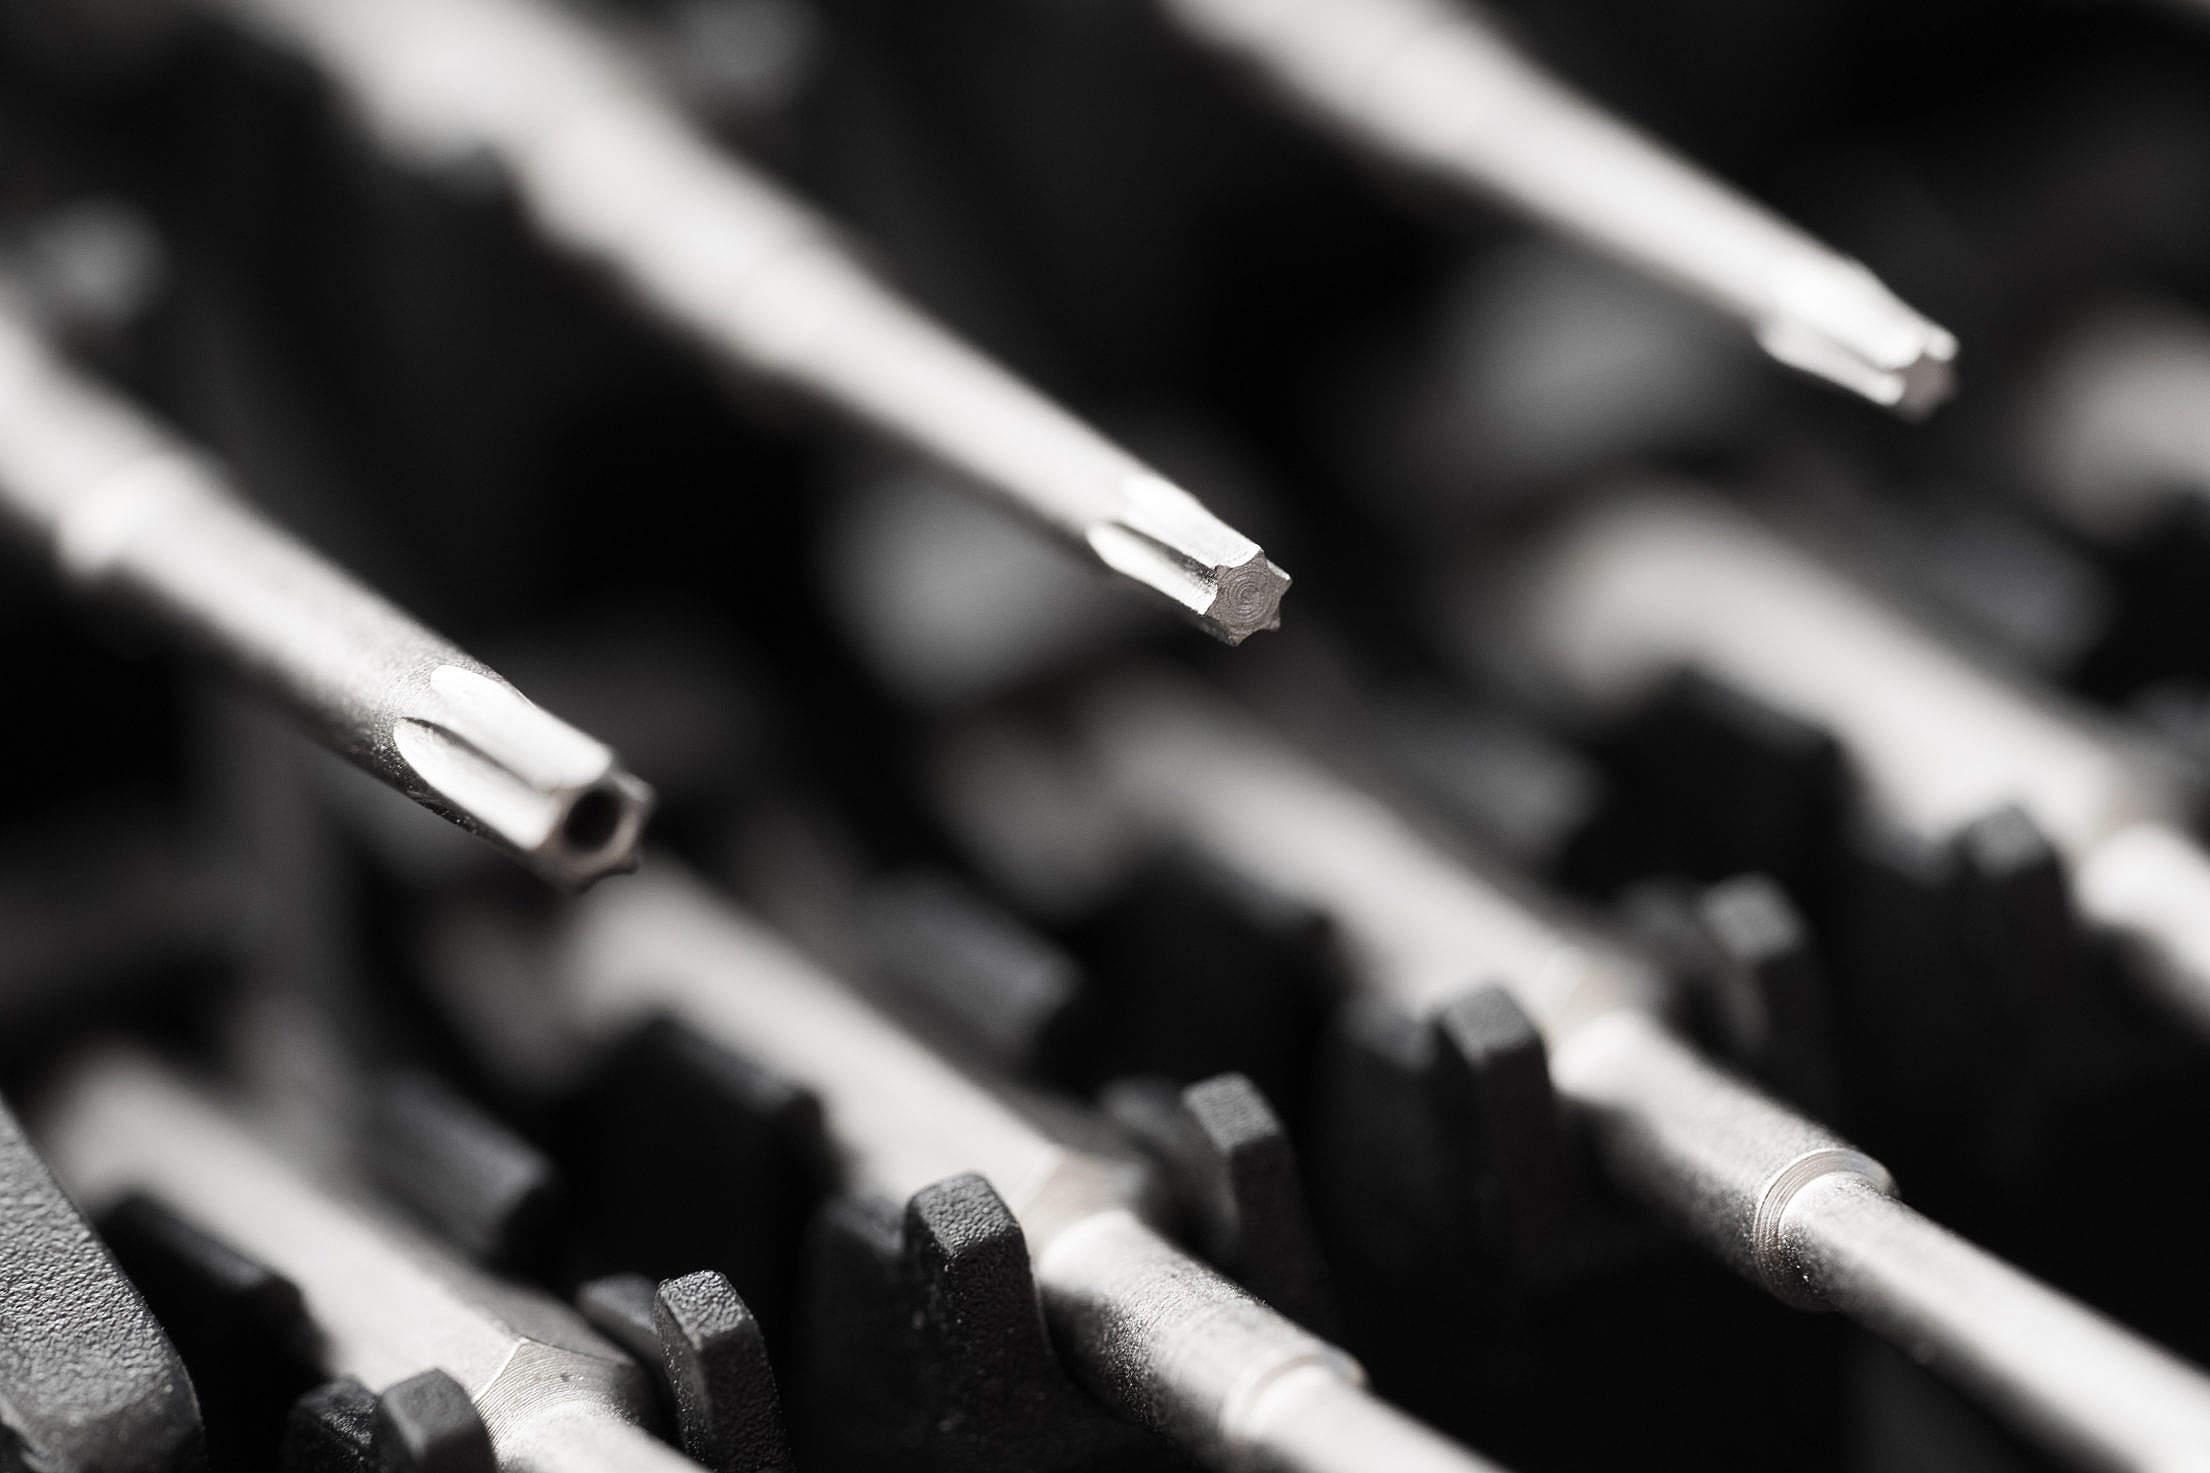 Precision Screwdrivers for Repairing Broken Smartphones Free Stock Photo